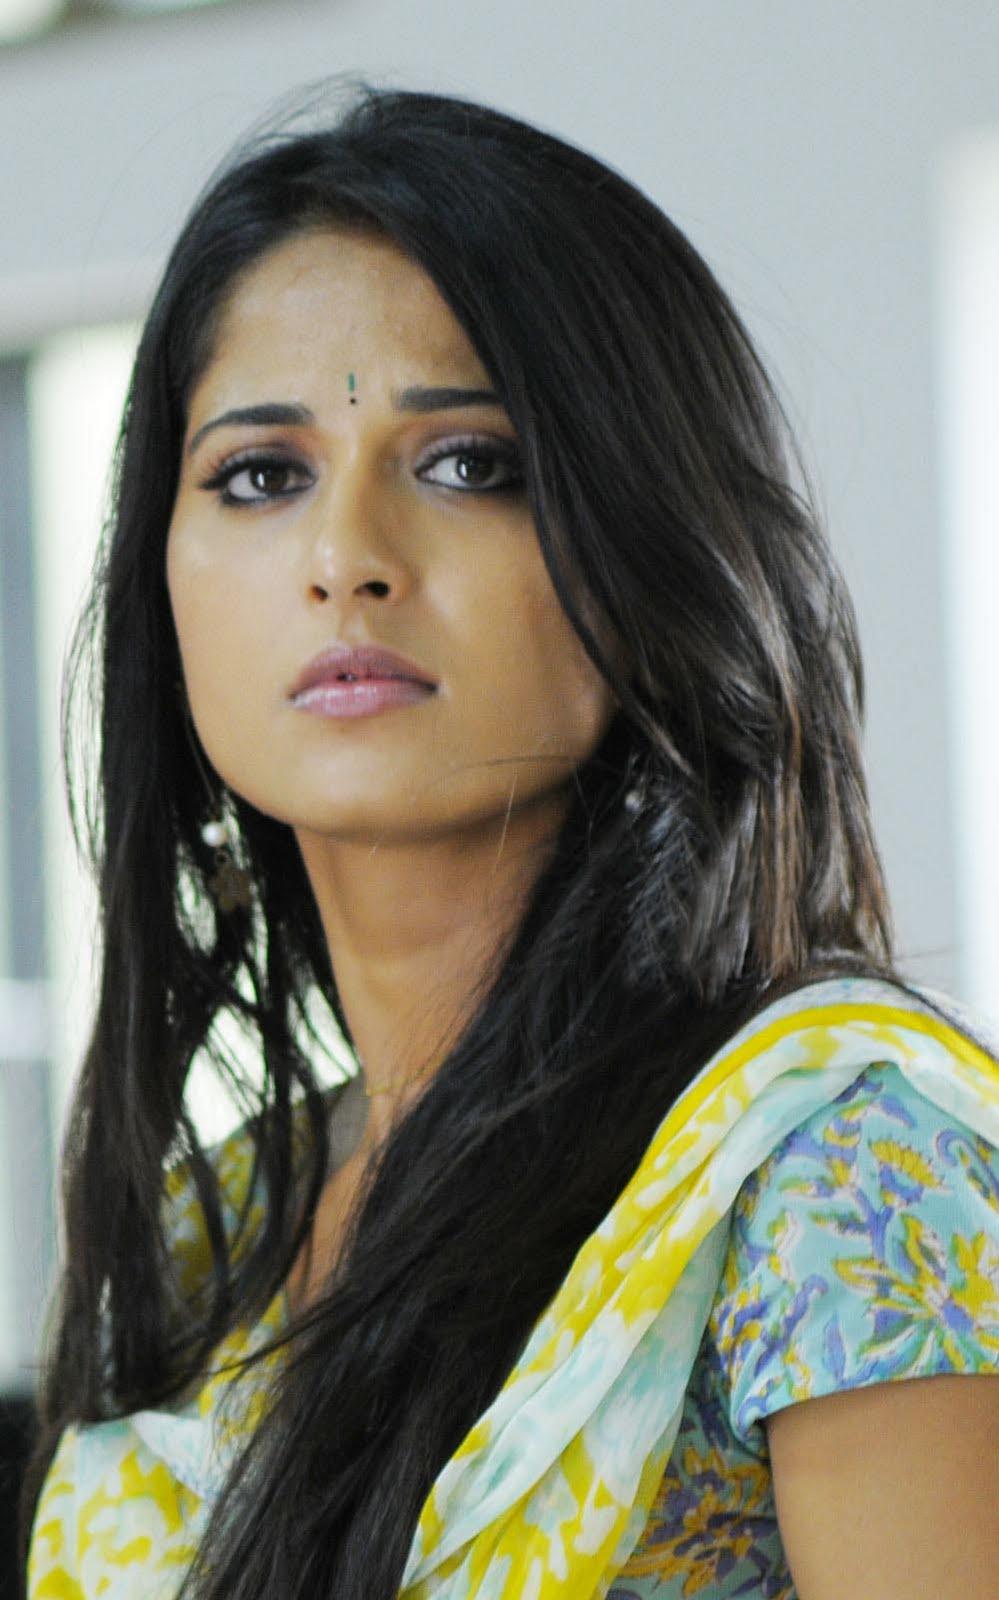 Anushka shetty anushka shetty hot stills pictures beautiful pictures - Anushka Shetty Beautiful Photos In Yellow Dress